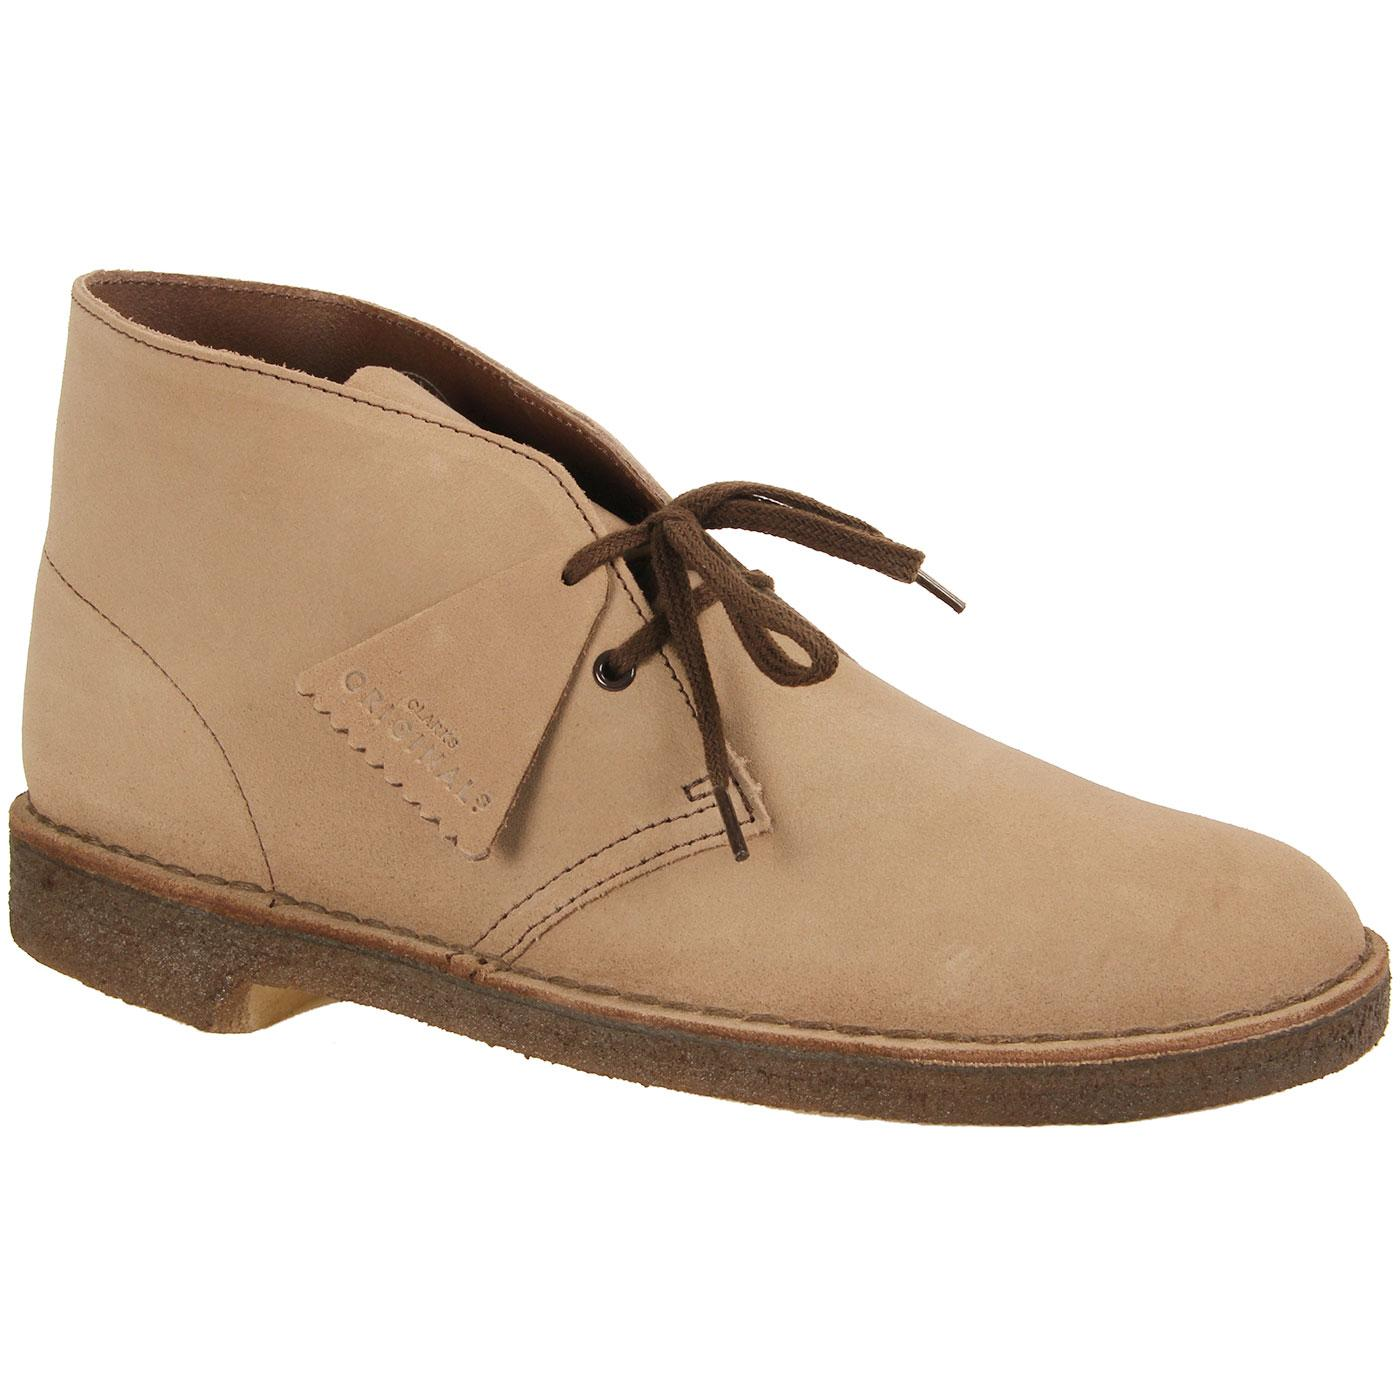 CLARKS ORIGINALS Men's Mod Desert Boots